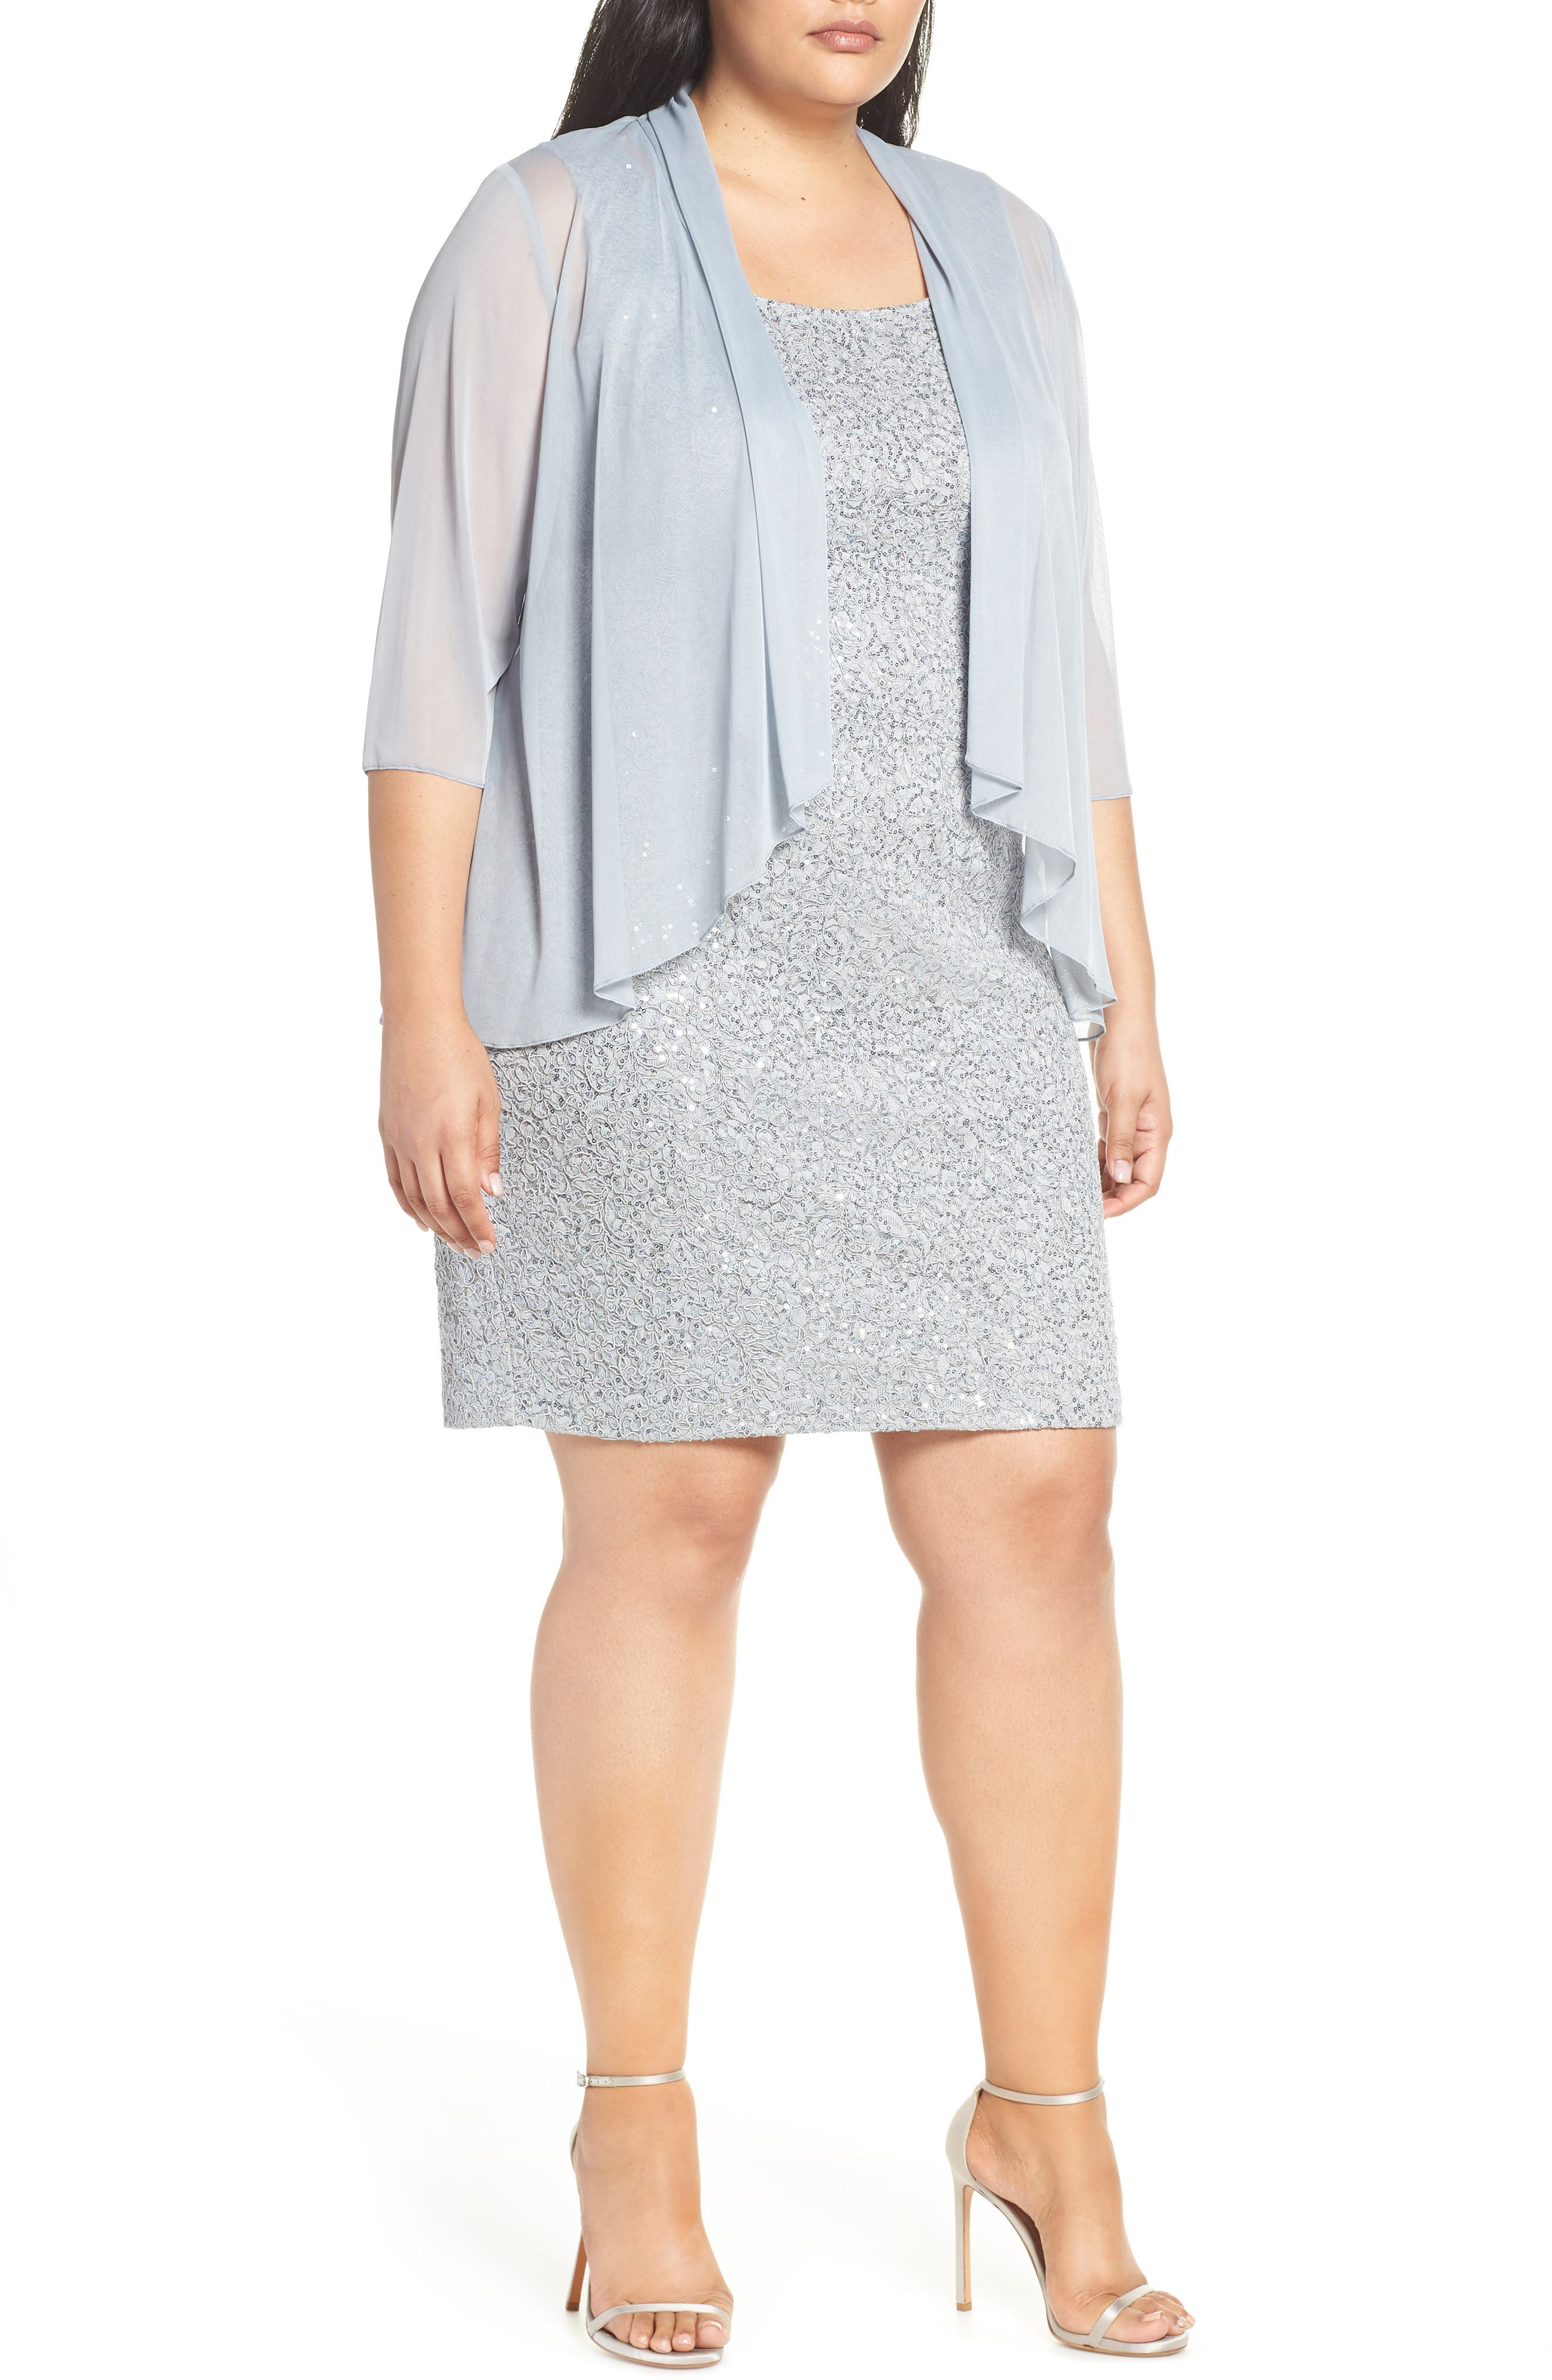 Plus Size Alex Evenings Sequin Sheath Dress & Chiffon Jacket, Blue